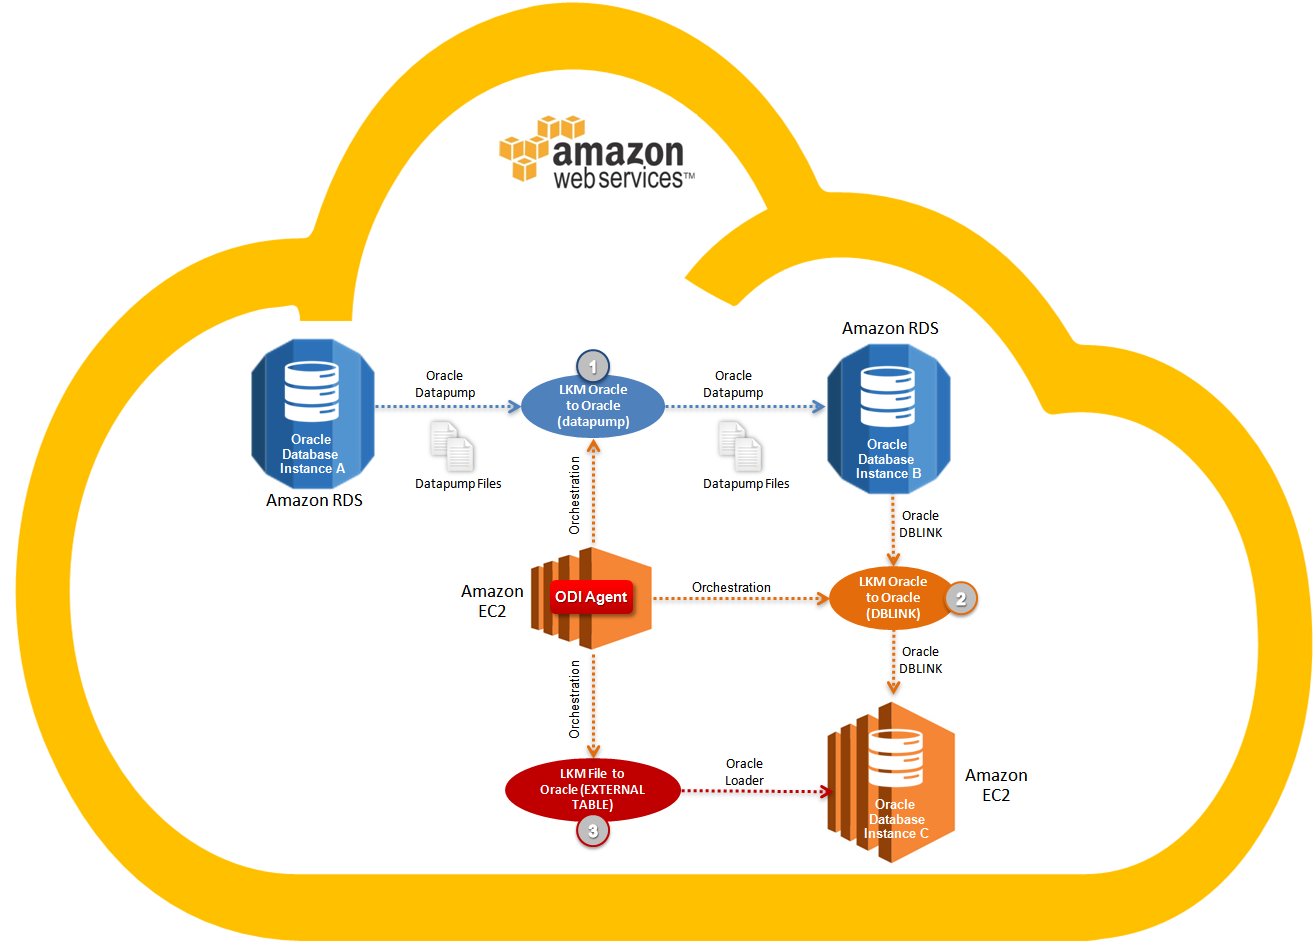 Using ODI Loading Knowledge Modules on the Oracle Database